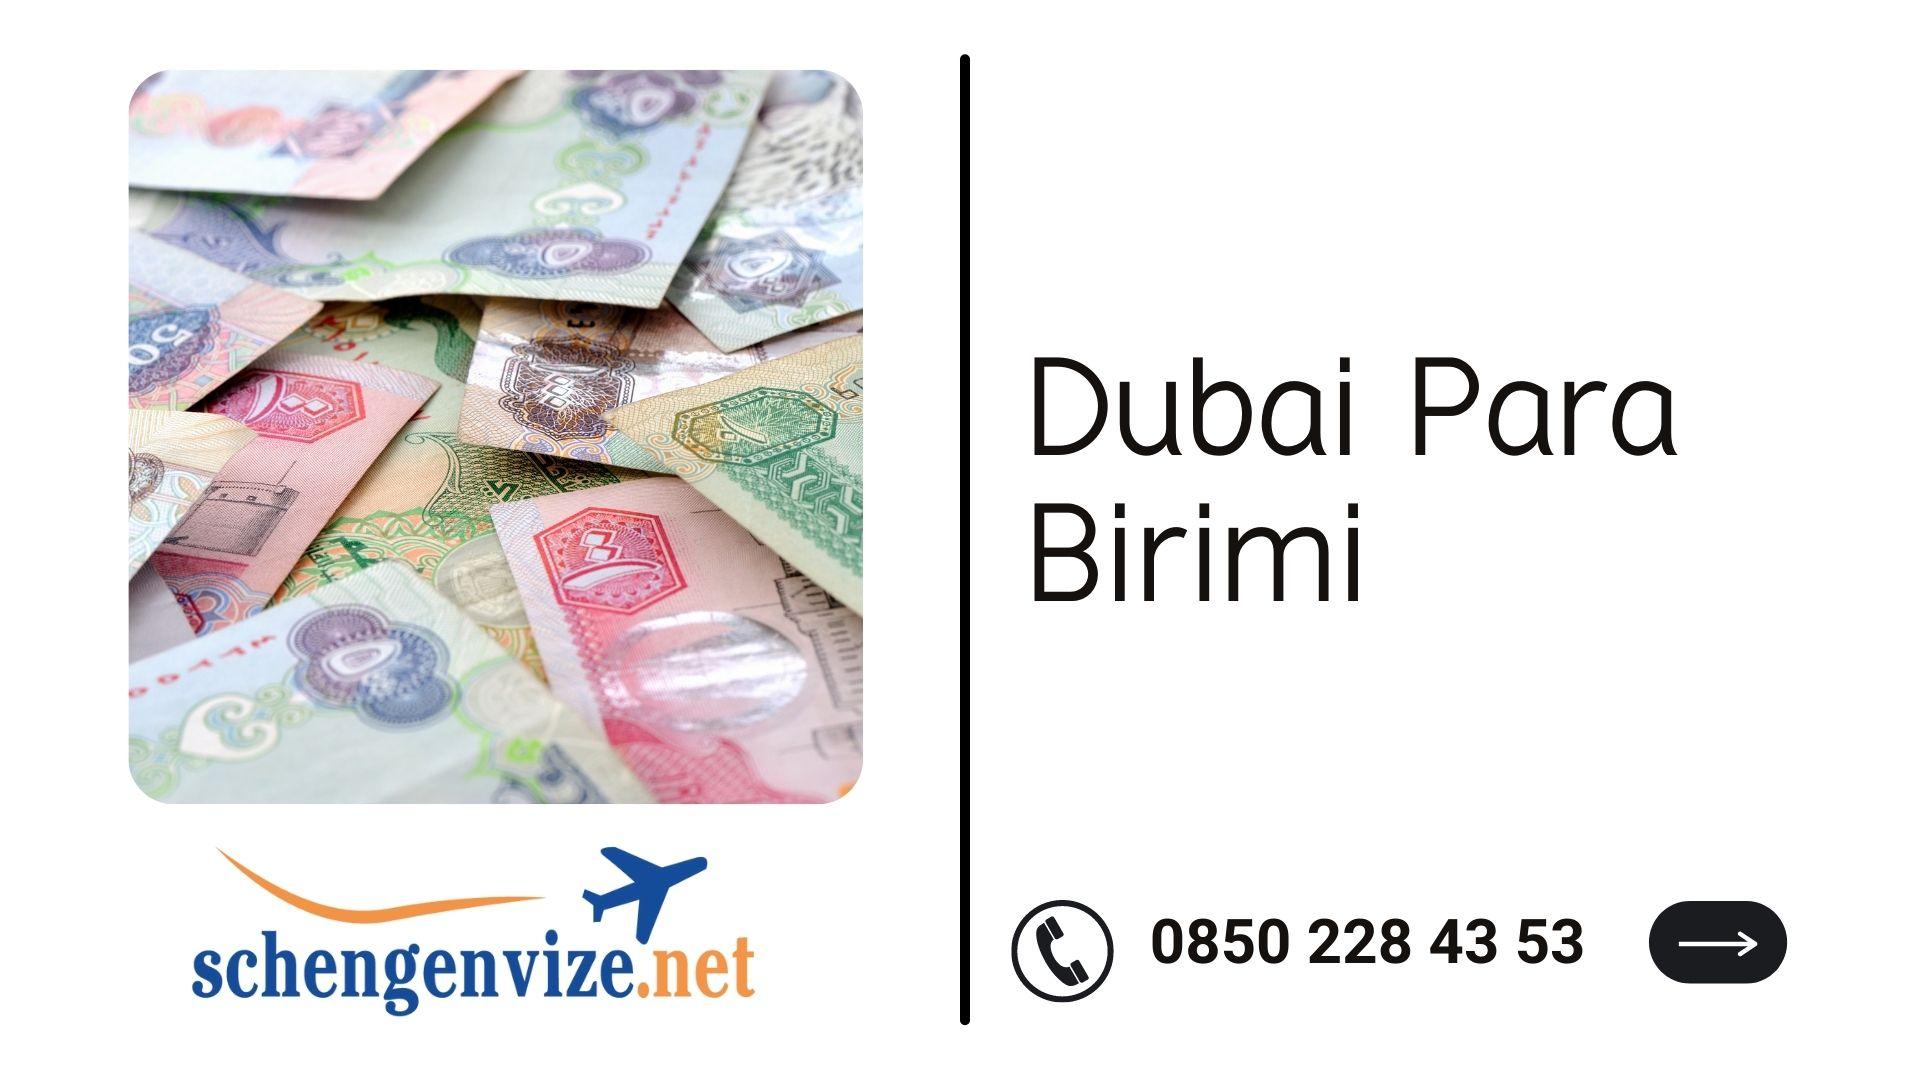 Dubai Para Birimi